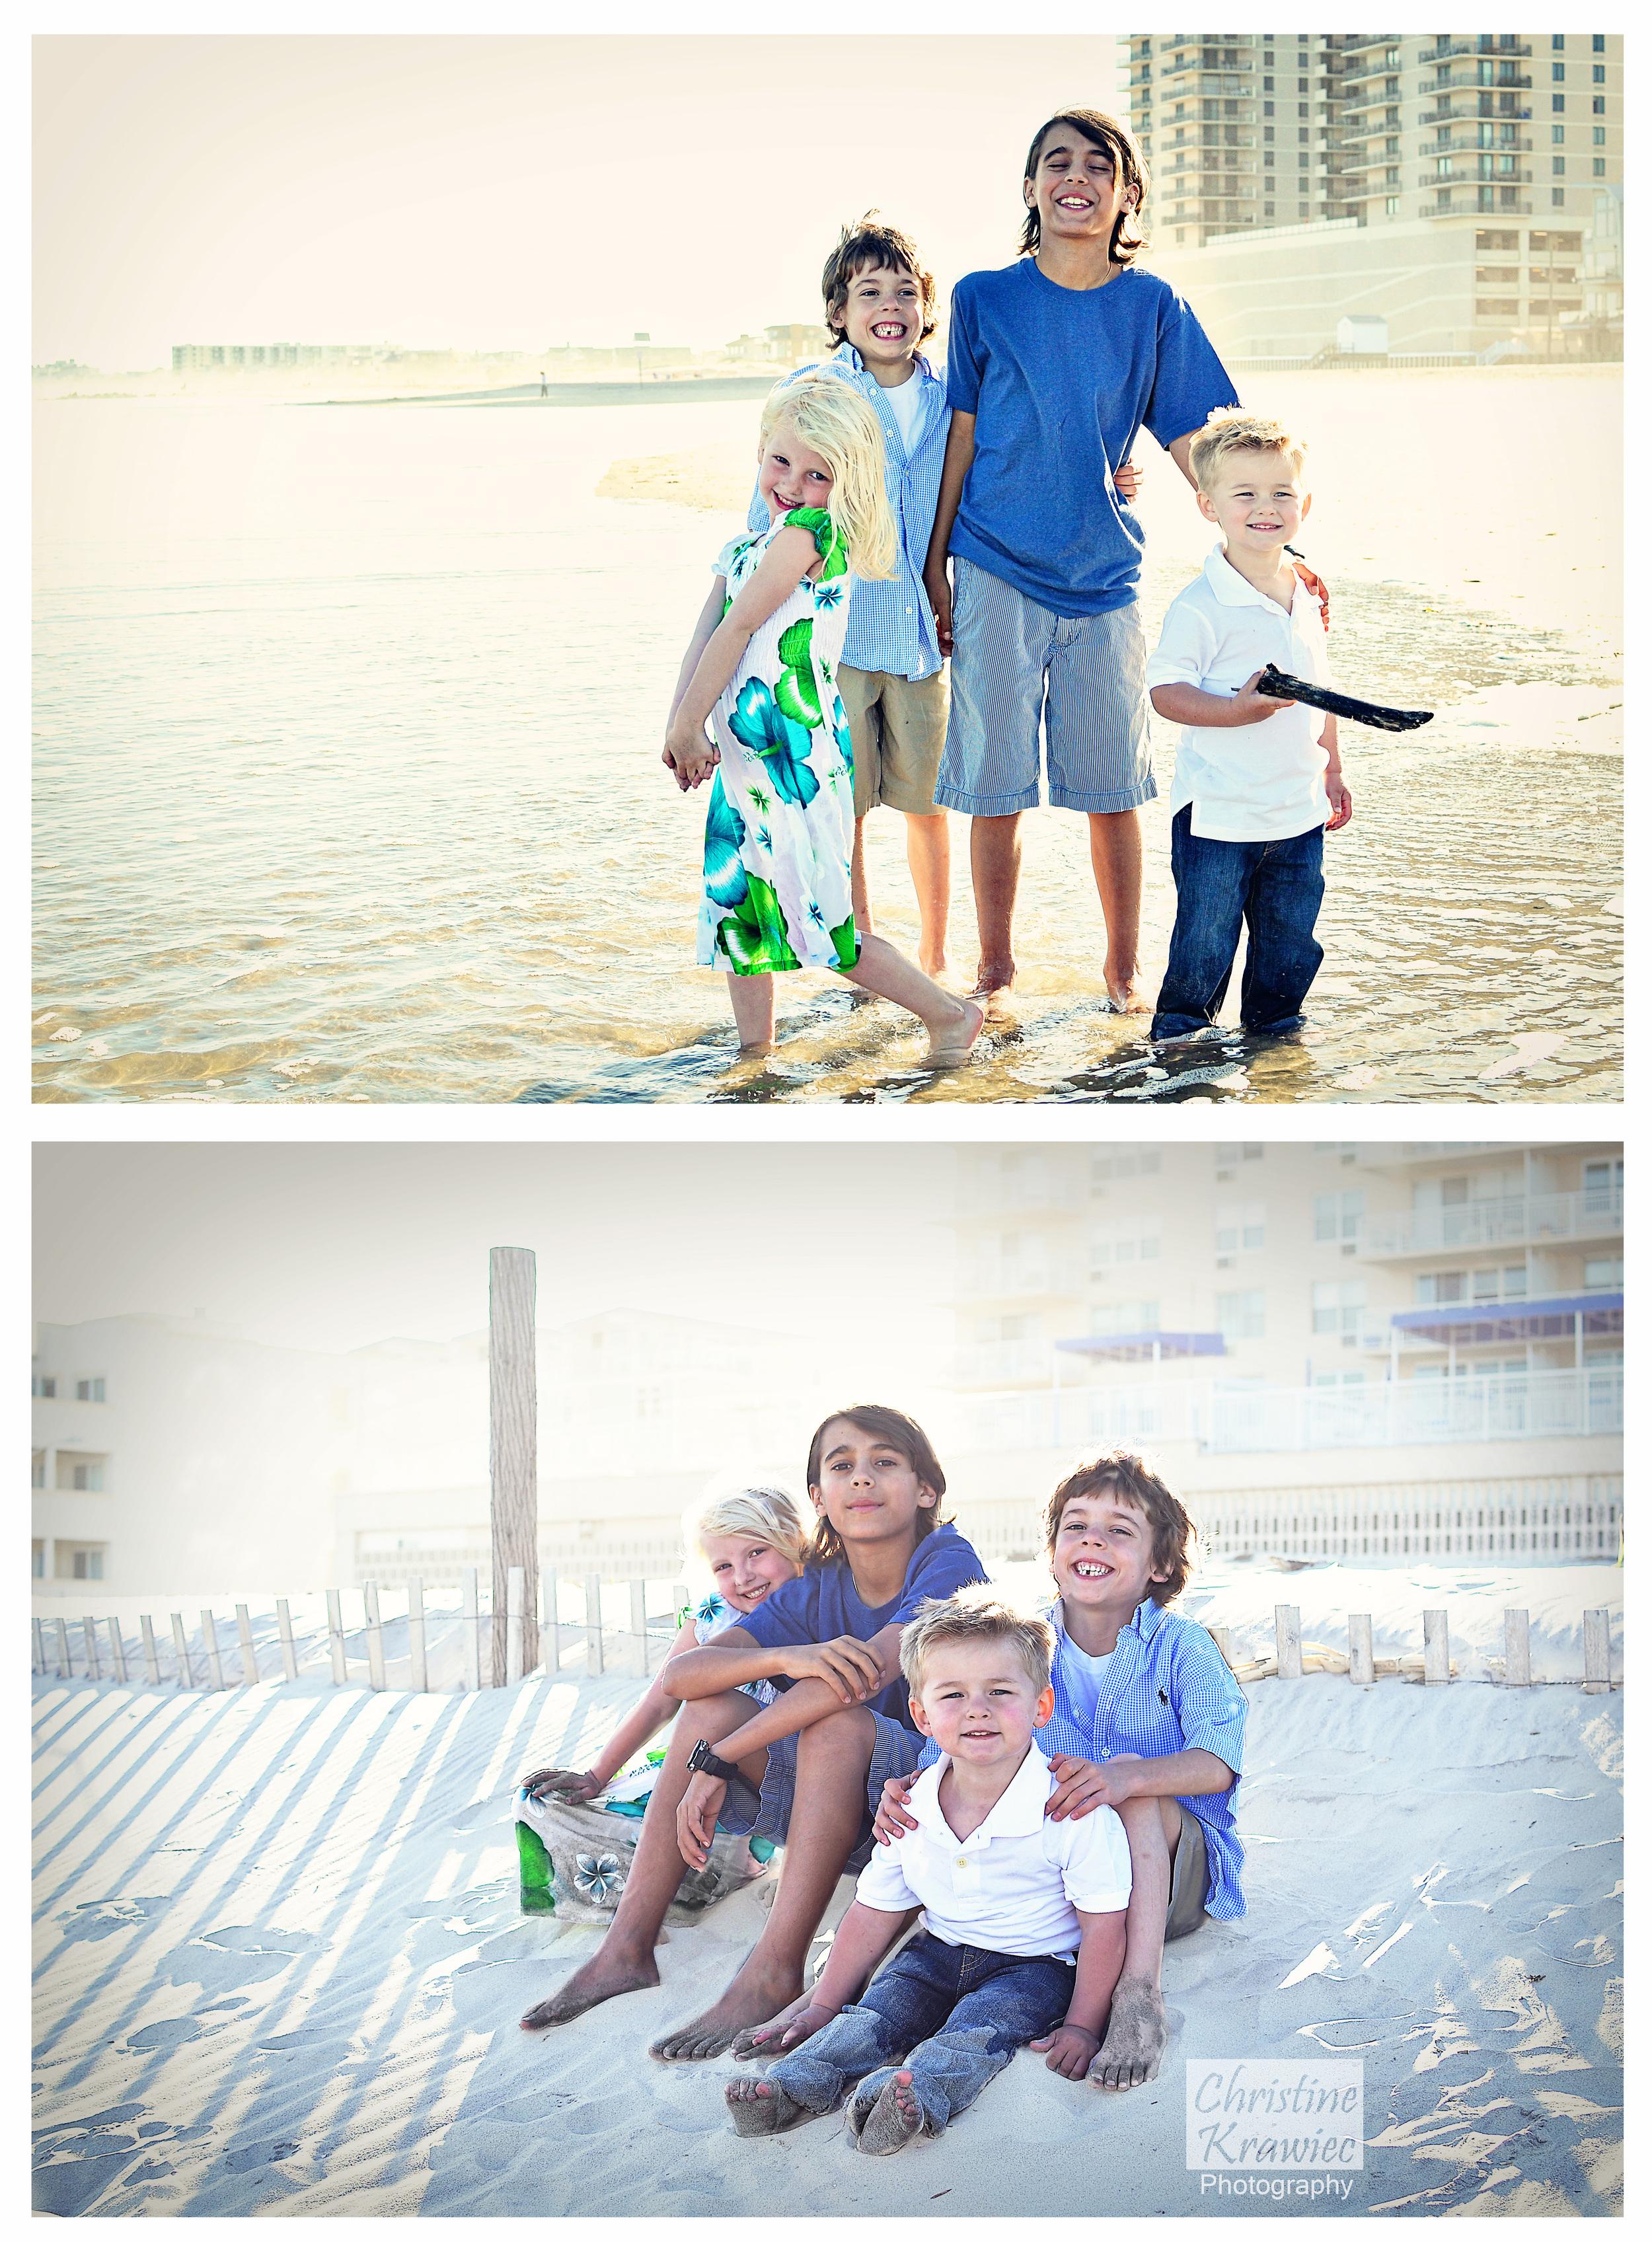 Christine Krawiec Photography - Margate Beach Photographer